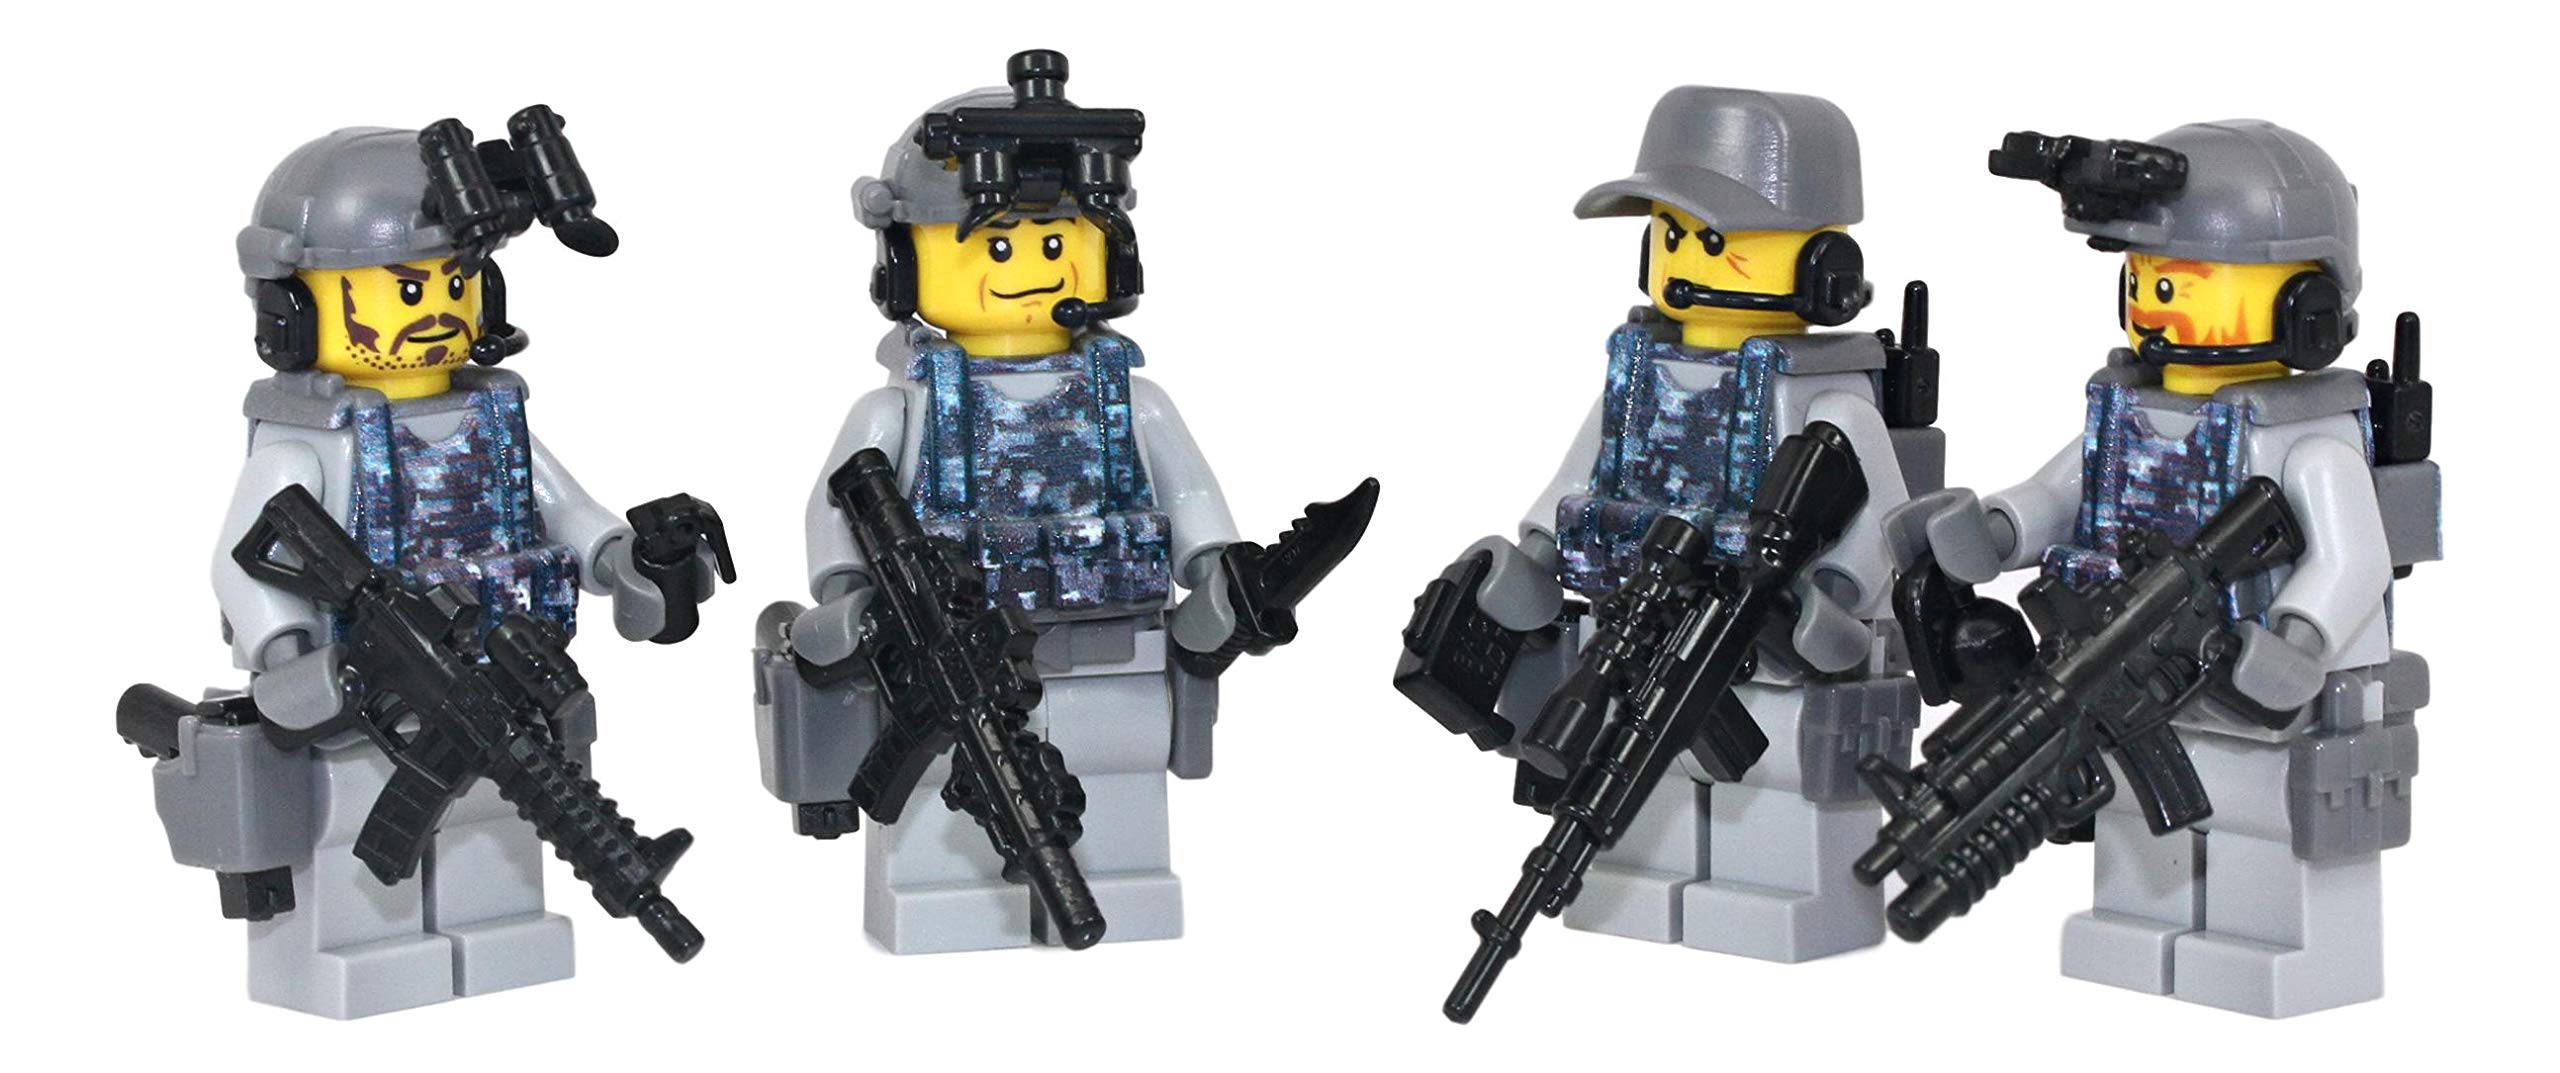 Navy Seal Team 6 Squad - Modern Brick Warfare Custom Minifigure